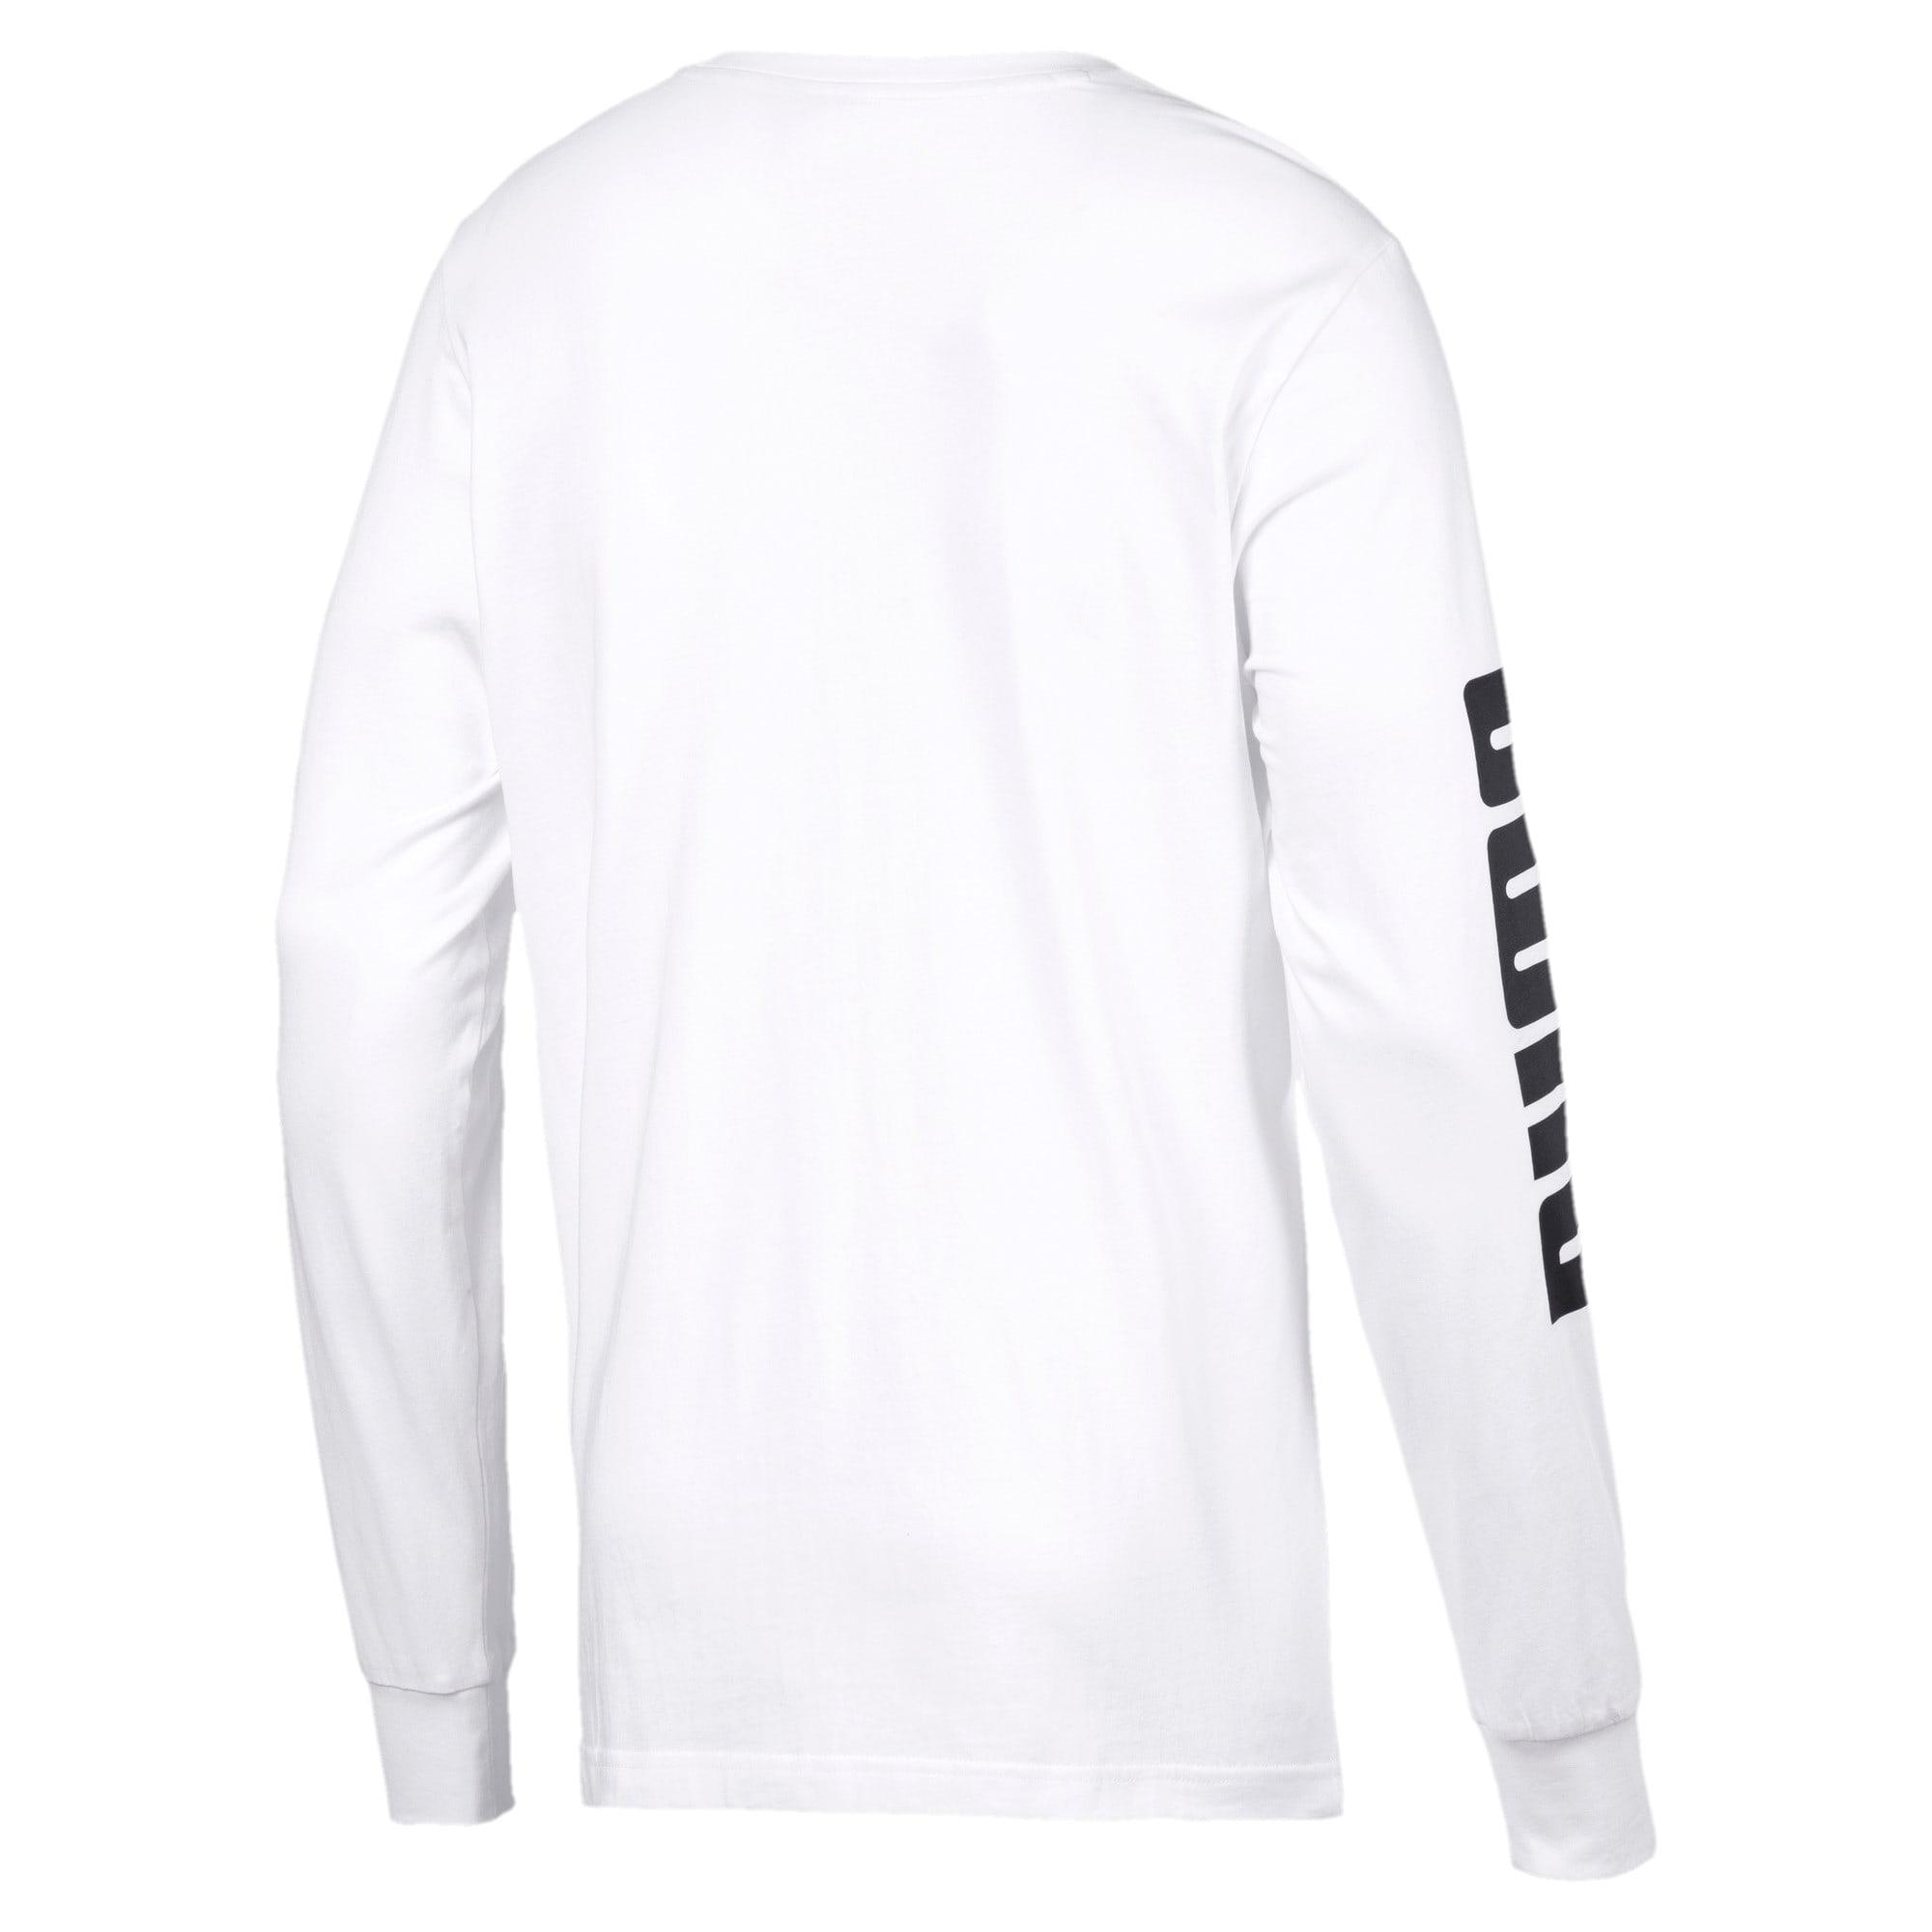 Thumbnail 5 of Classics Logo Men's Long Sleeve Tee, Puma White, medium